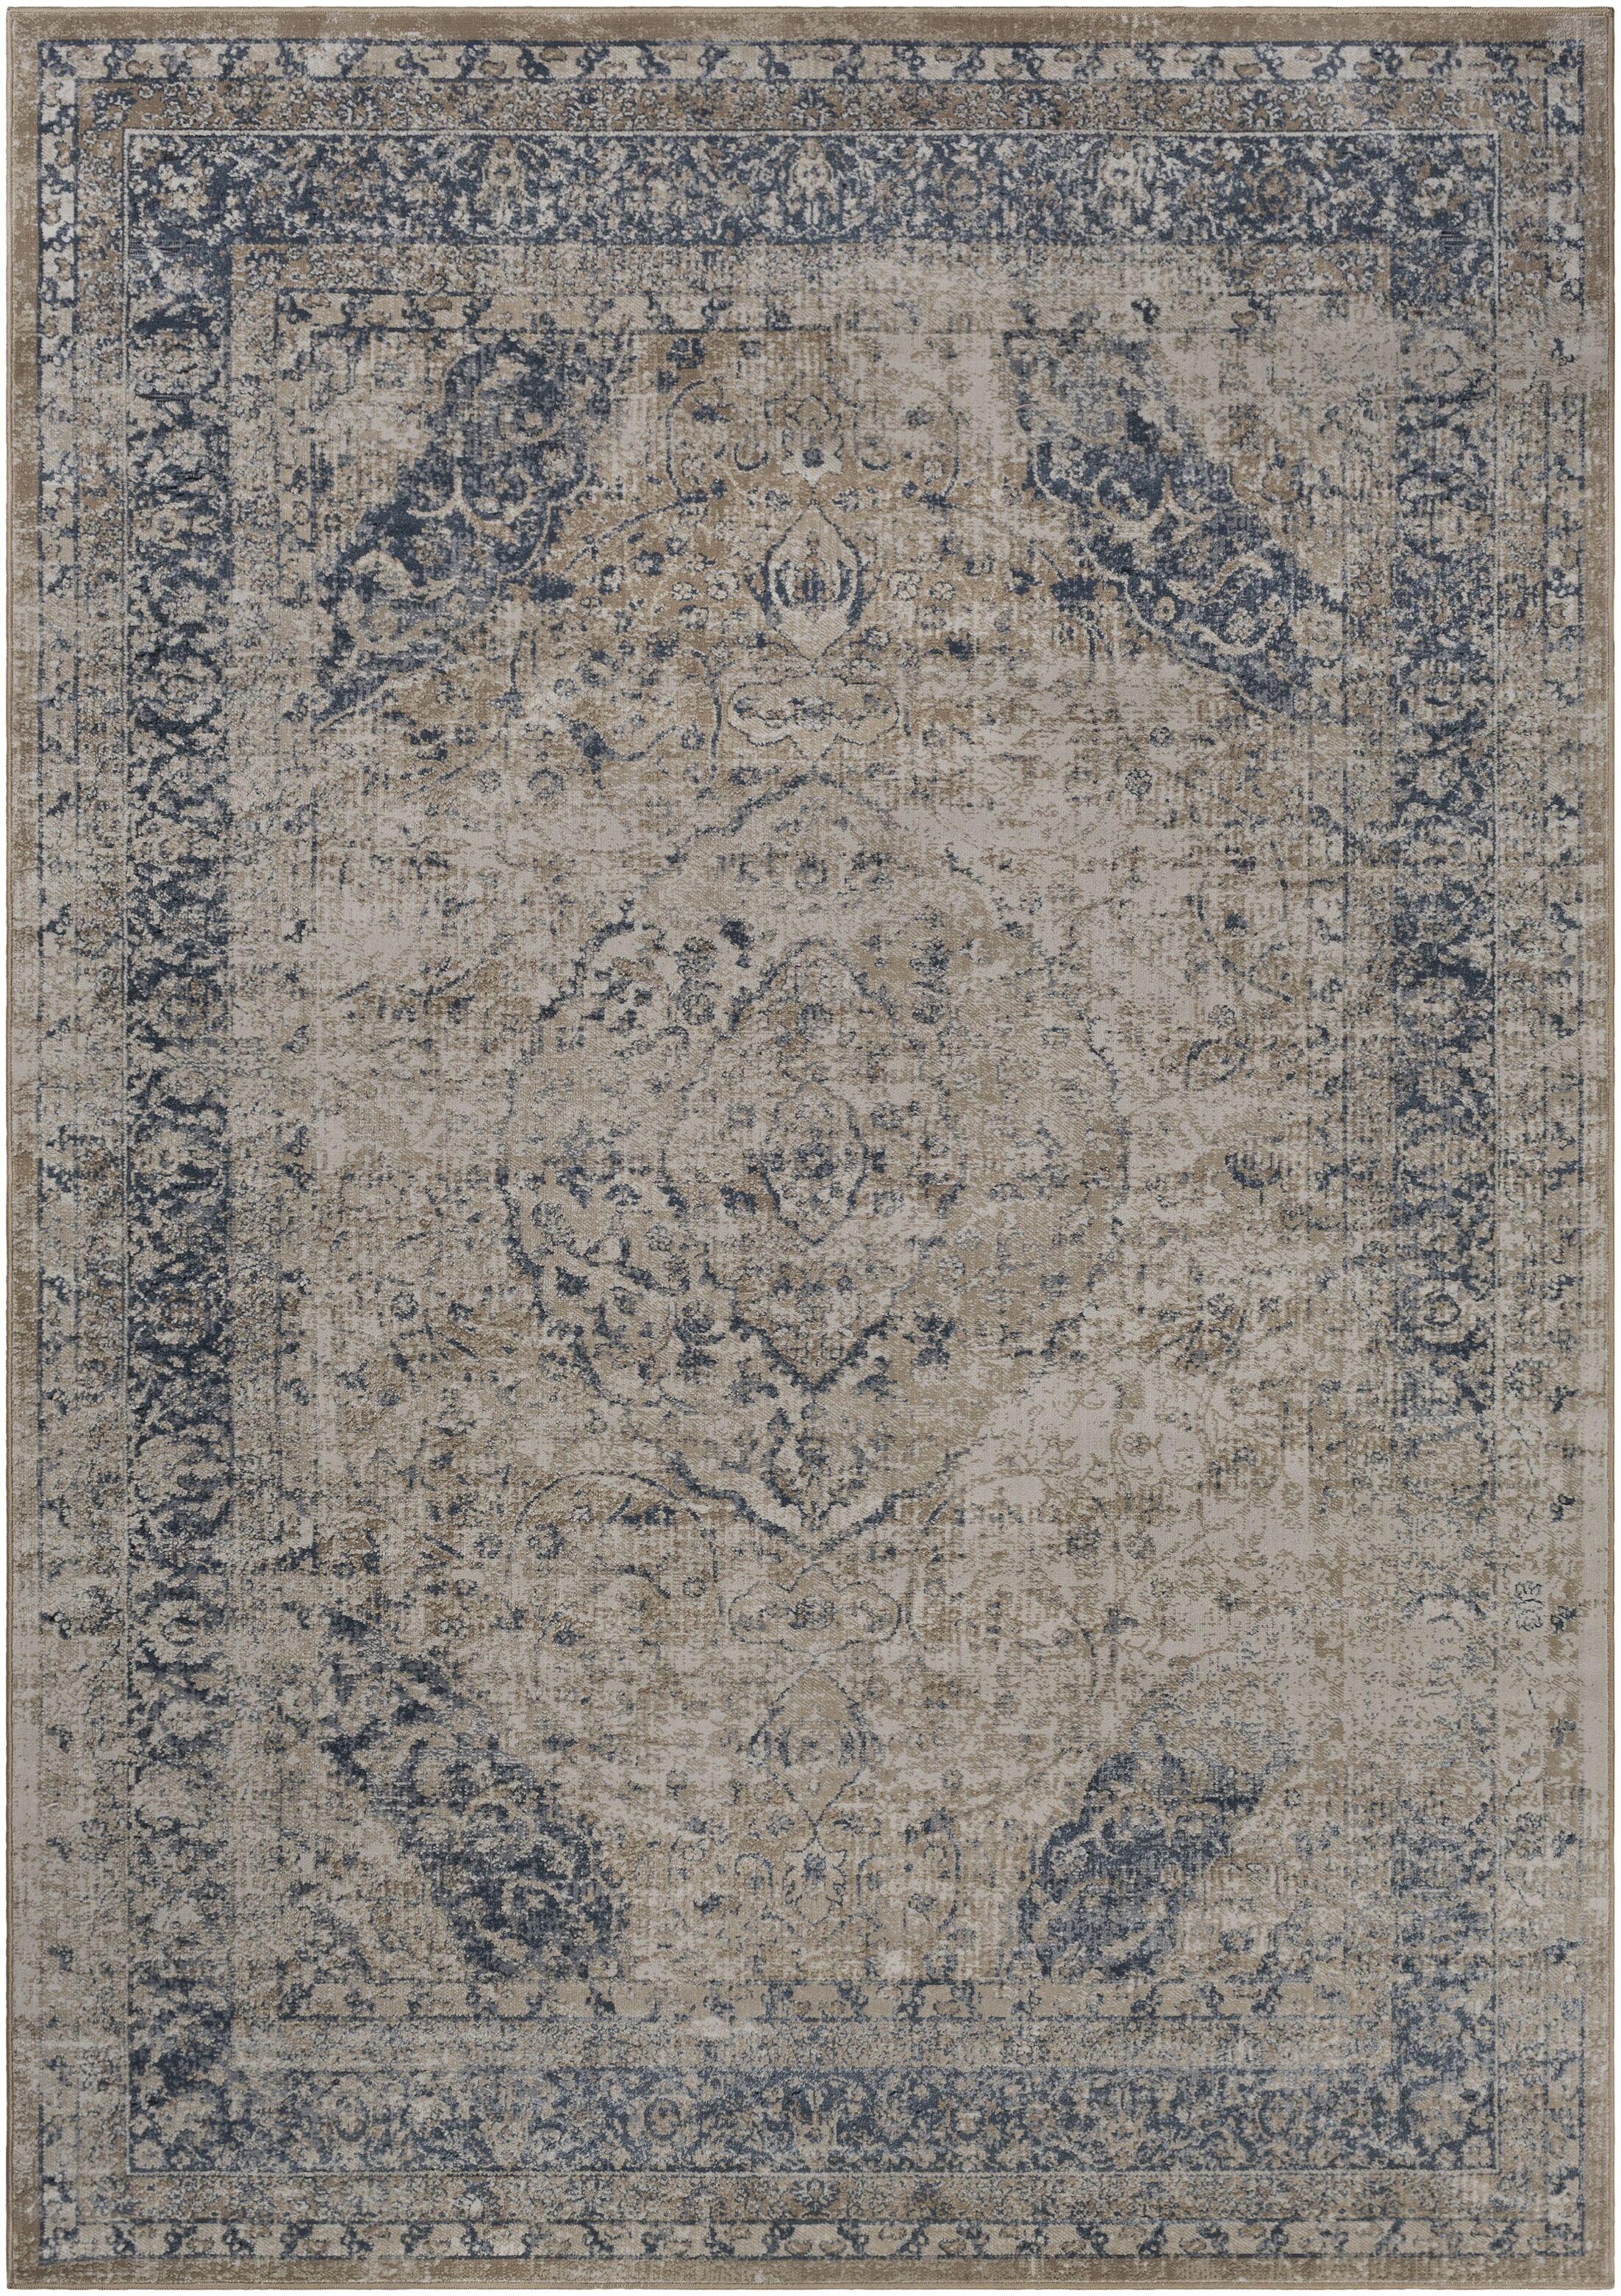 Barthe Beige/Khaki Area Rug Rug Size: Rectangle 6'7